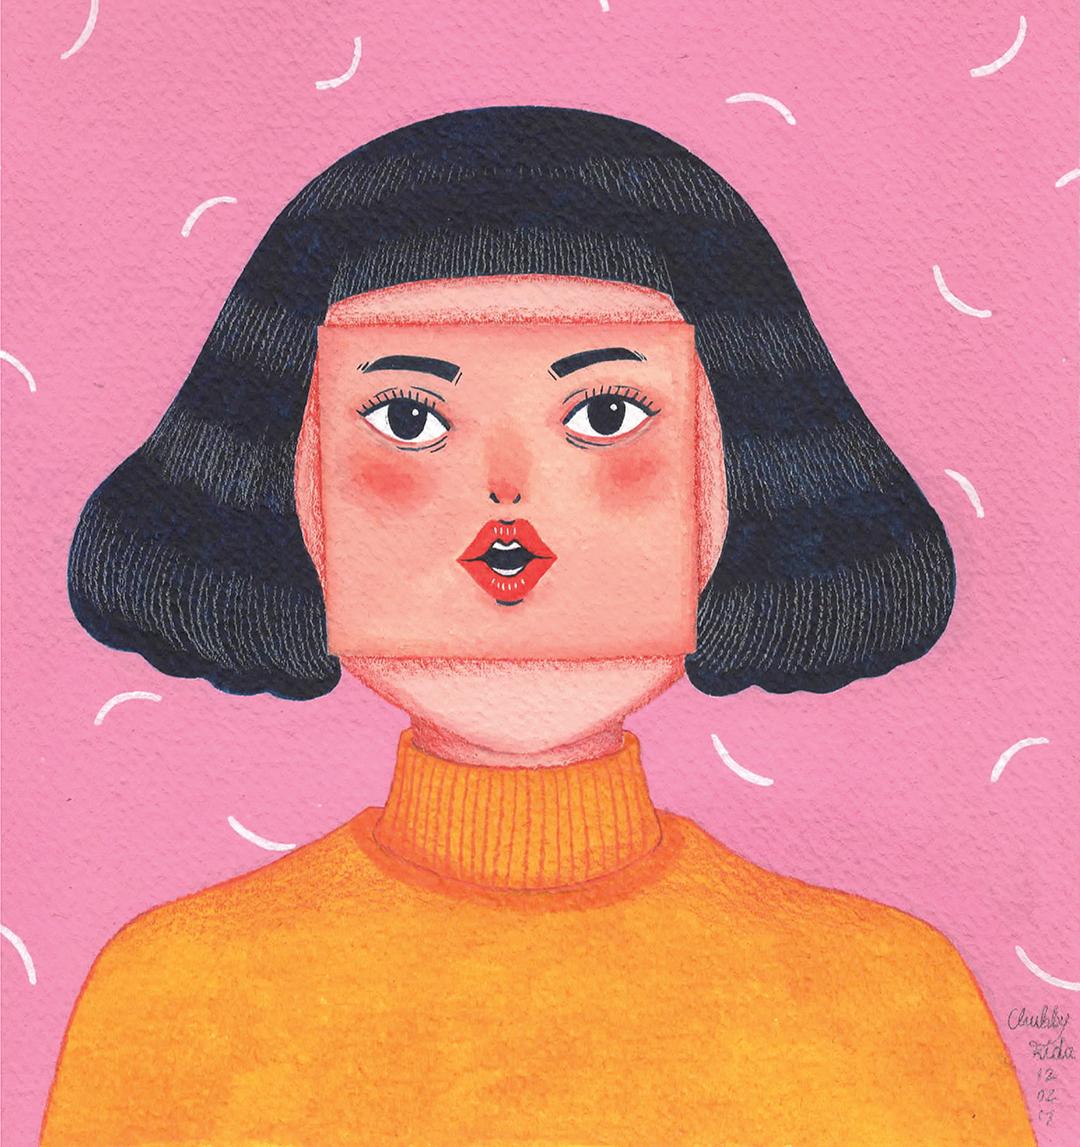 GirlsclubAsia-Illustrator-Chubbynida-artwork-04.jpg